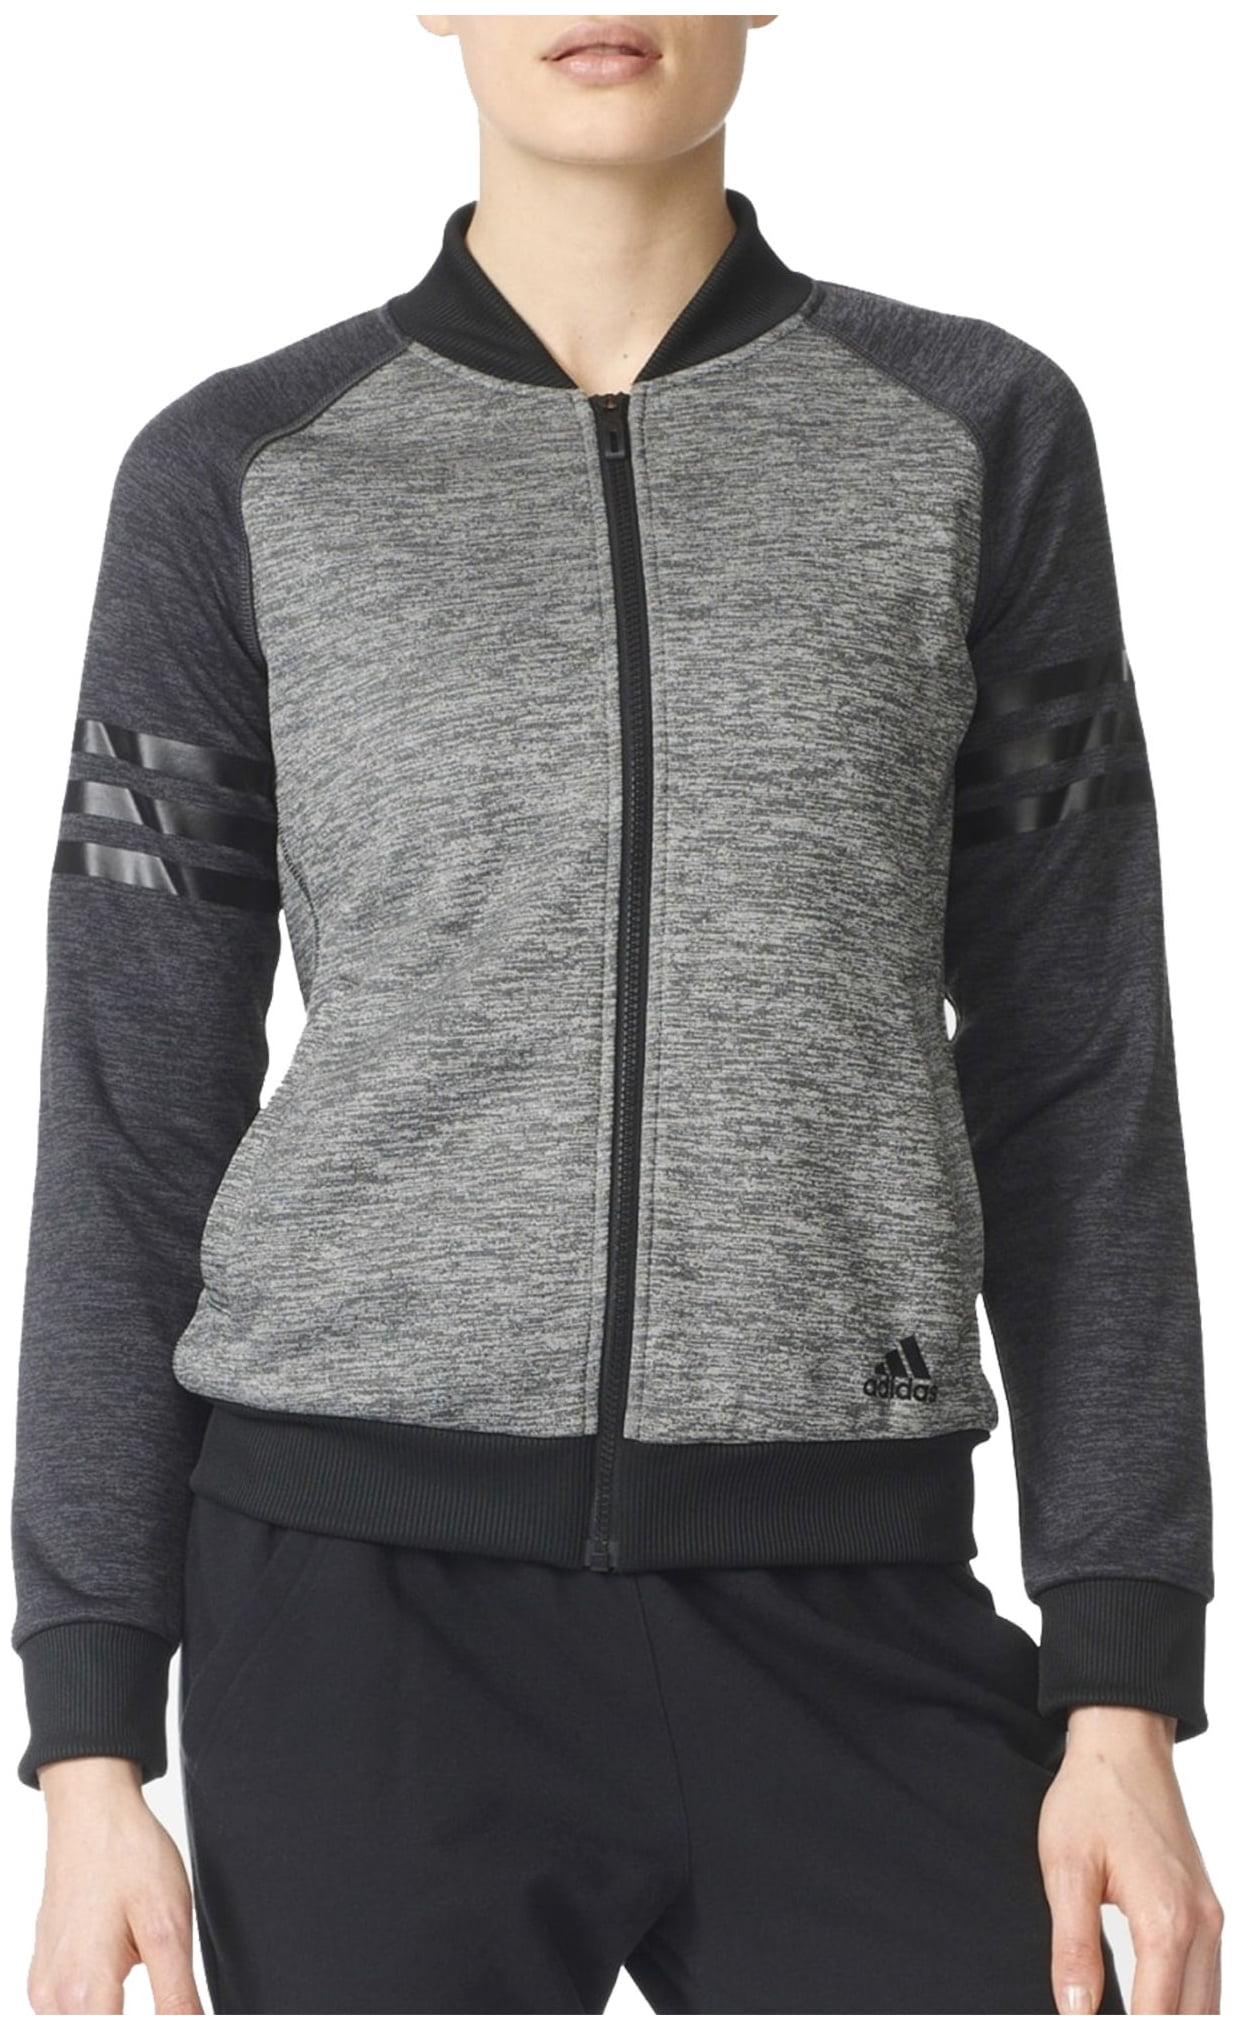 lowest price 0a490 769c7 adidas - adidas Womens Team Issue Fleece Baseball Jacket - W